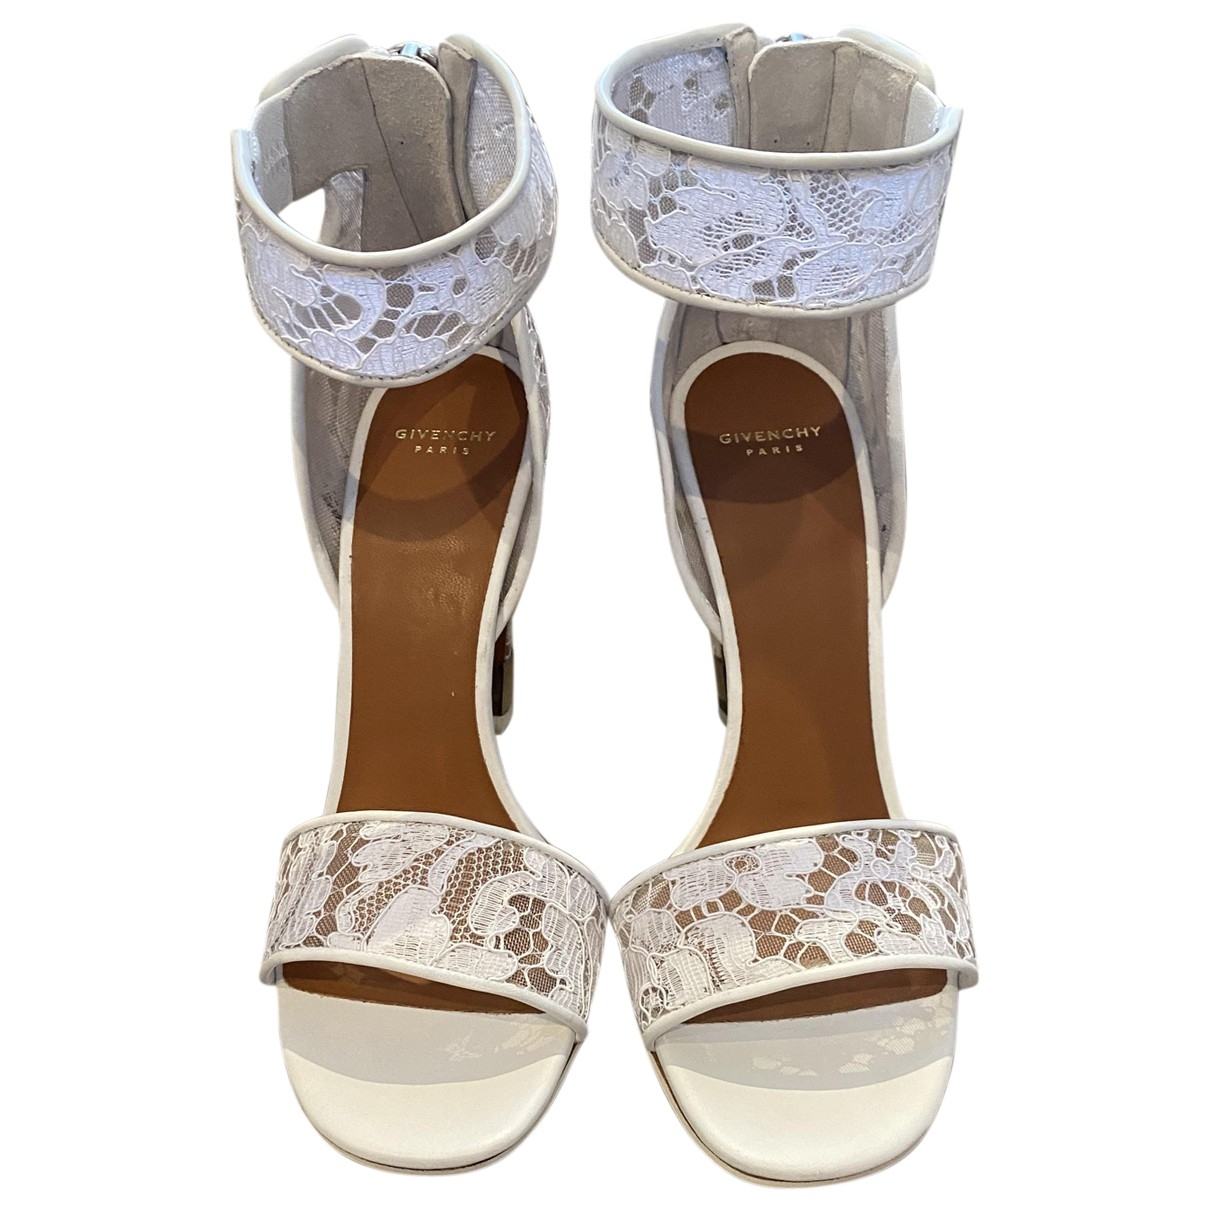 Sandalias de Lona Givenchy